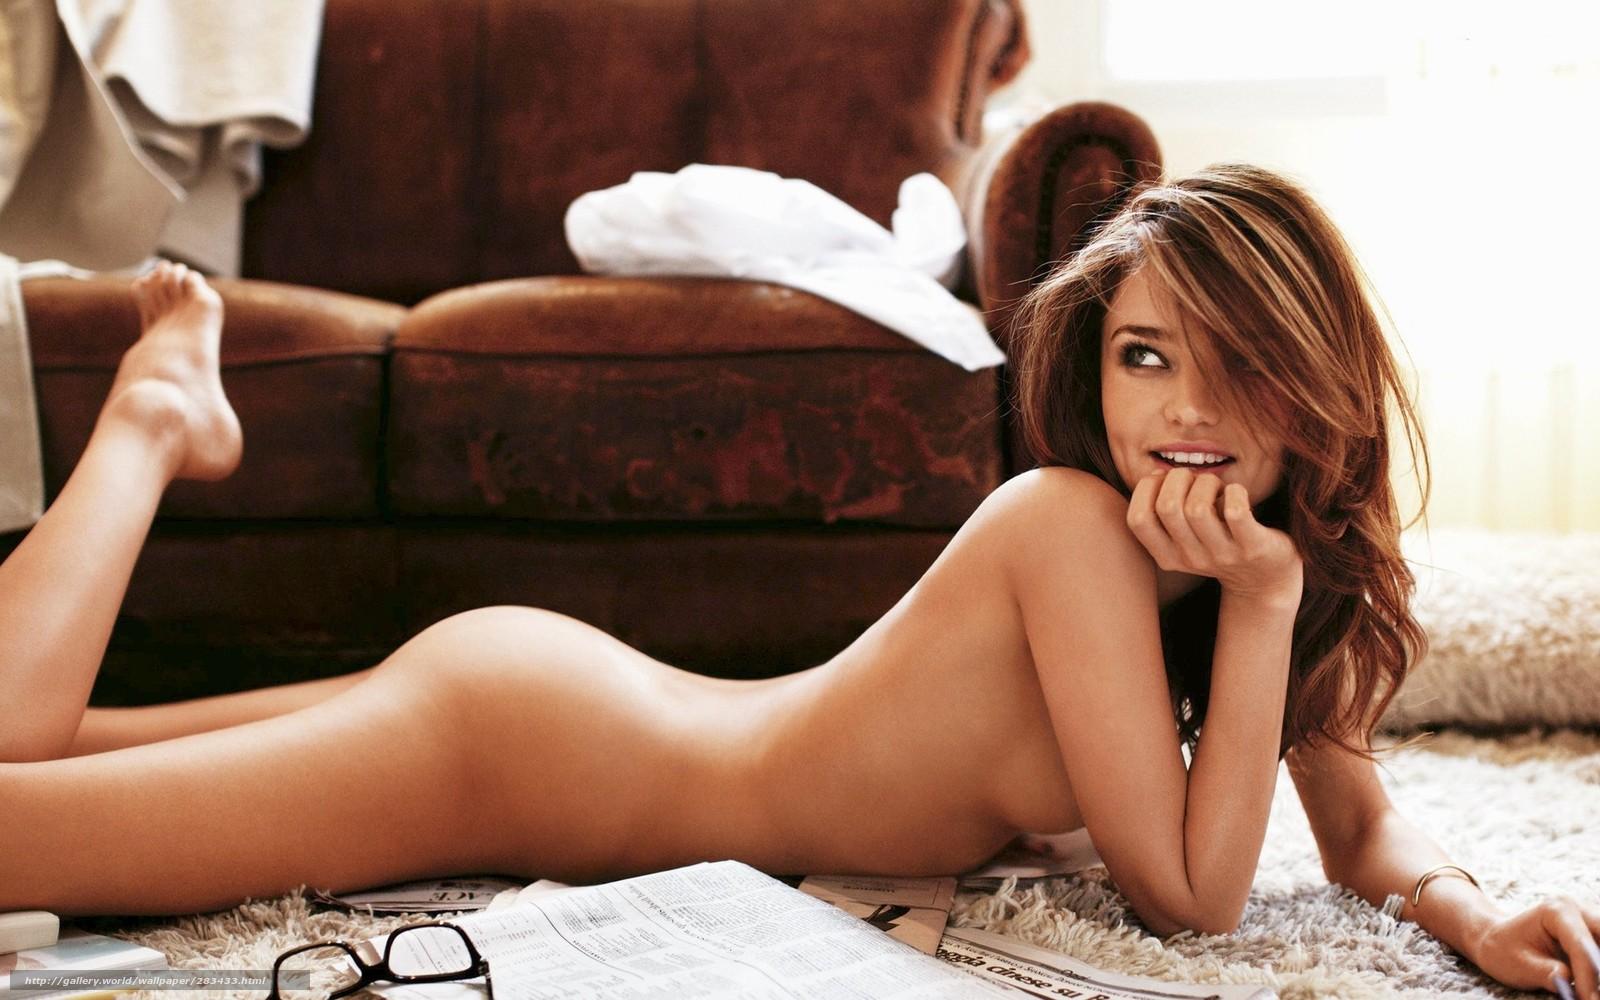 anal escort amatööri seksi videot